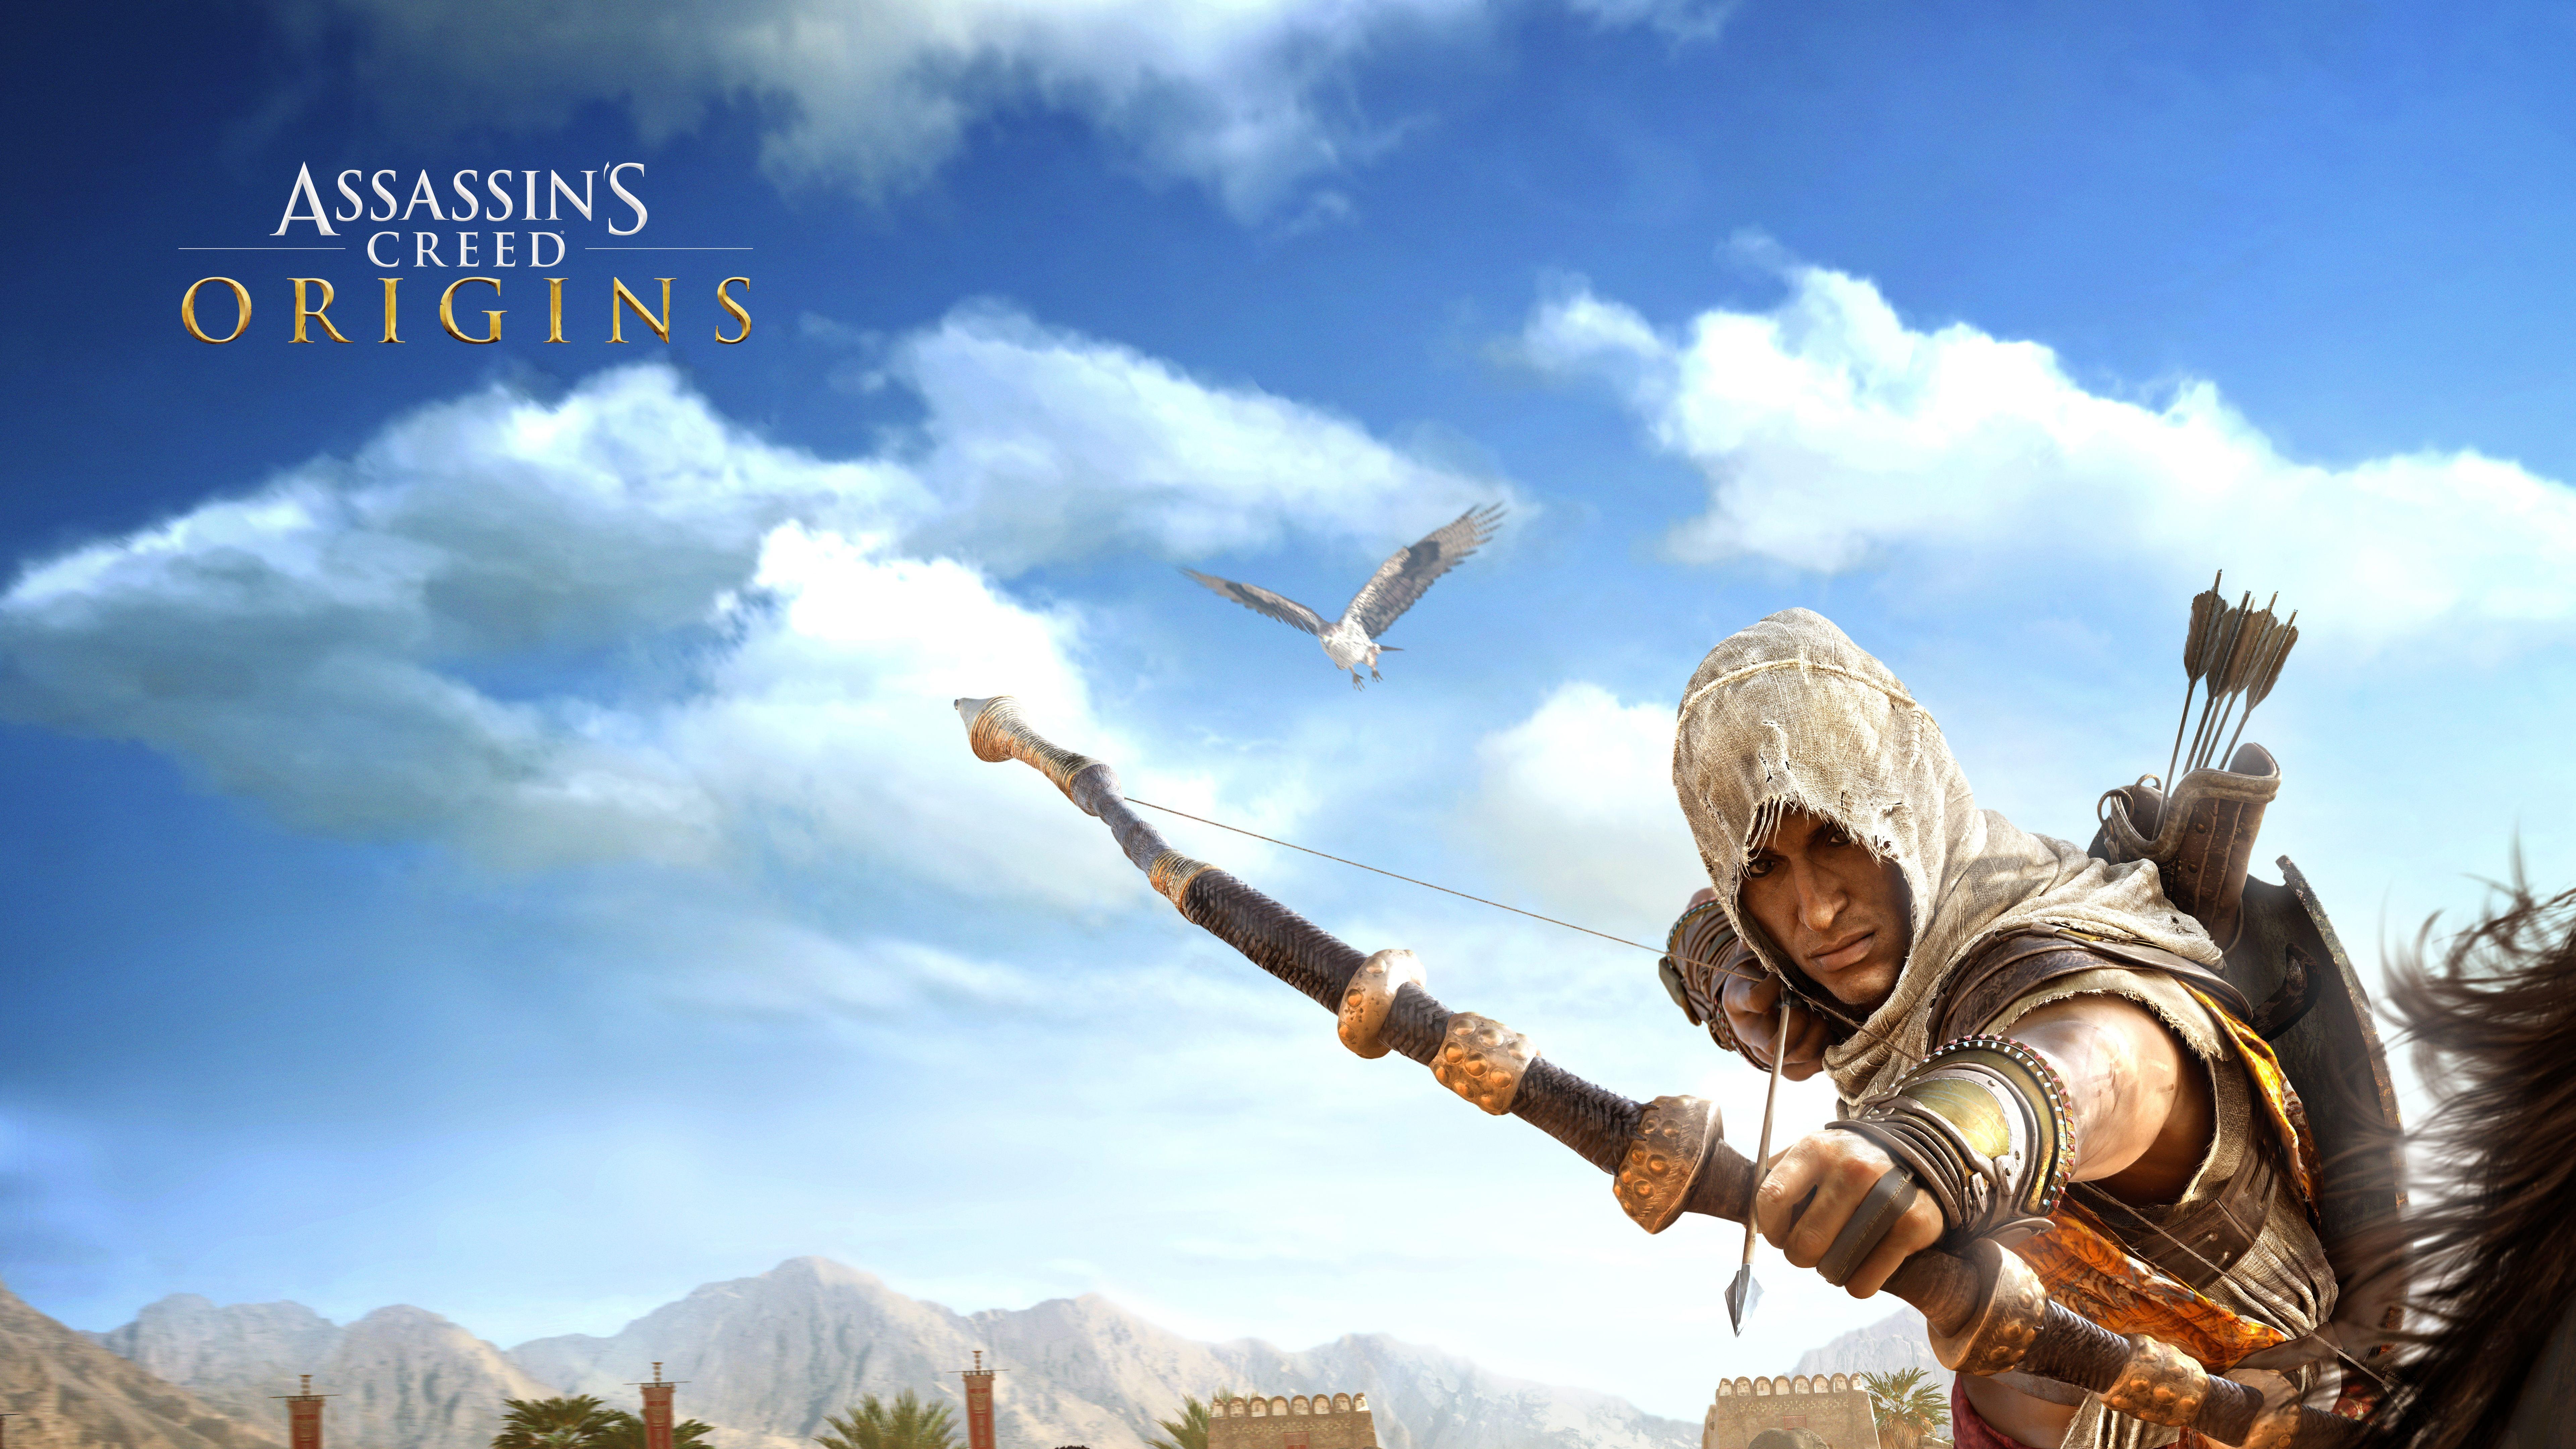 2018 Assassins Creed Origins 4k Hd Games 4k Wallpapers: Bayek Of Siwa Assassins Creed Origins 8k, HD Games, 4k